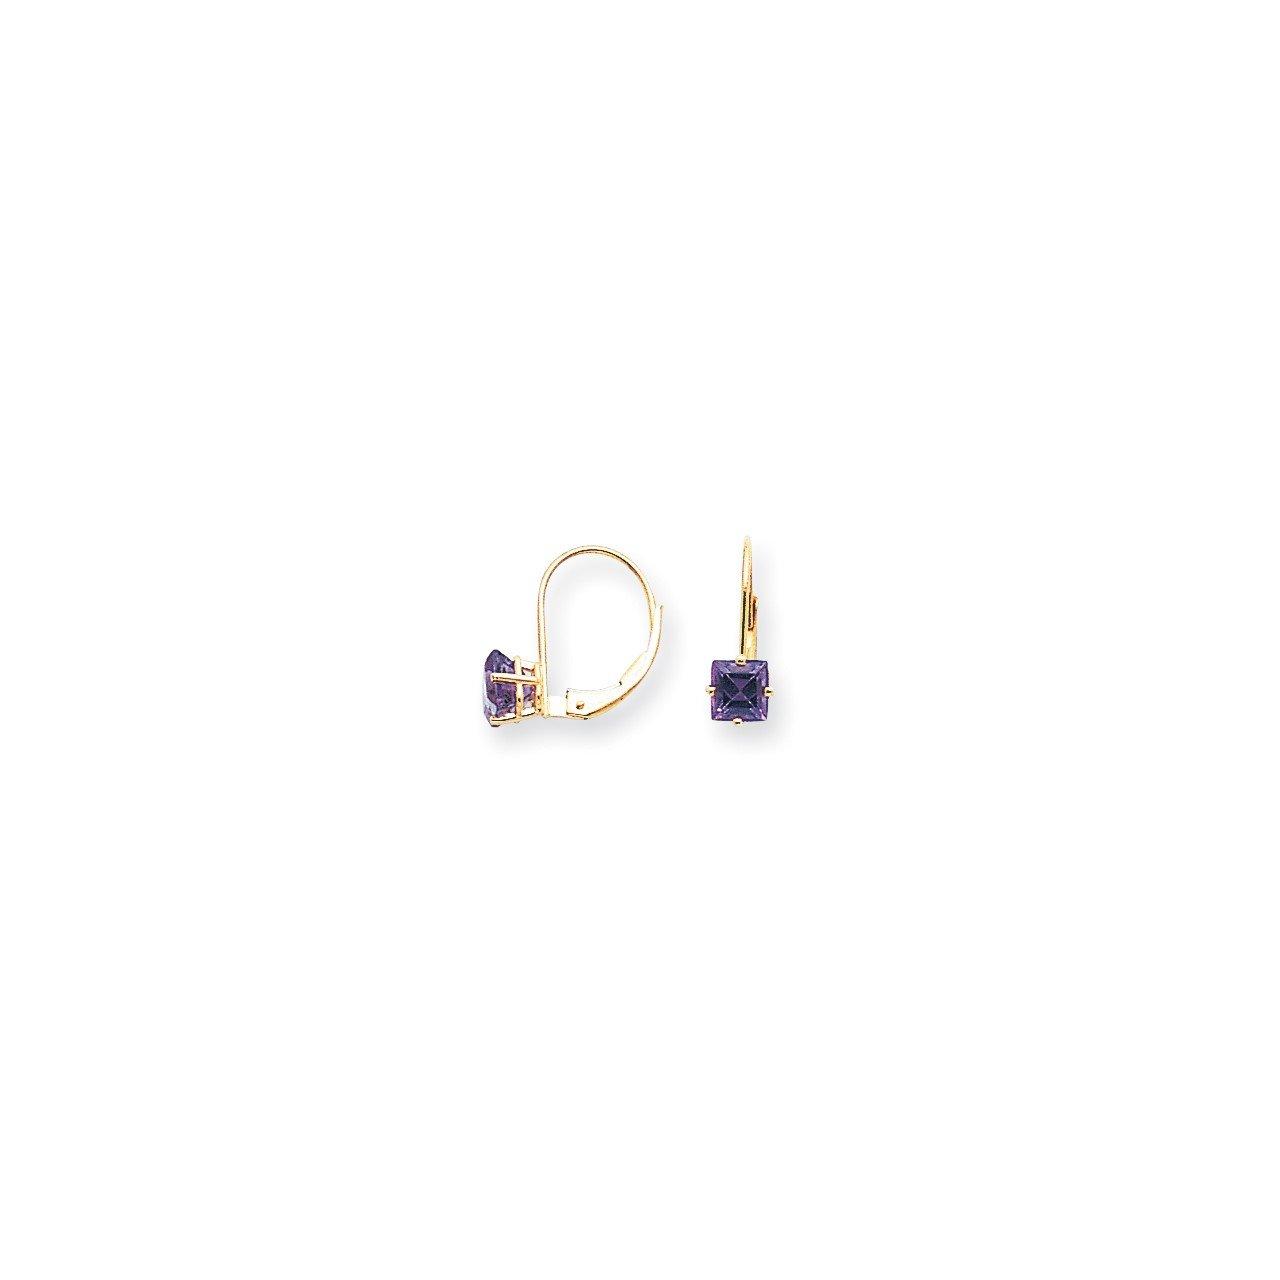 14k 5mm Princess Cut Amethyst Leverback Earrings